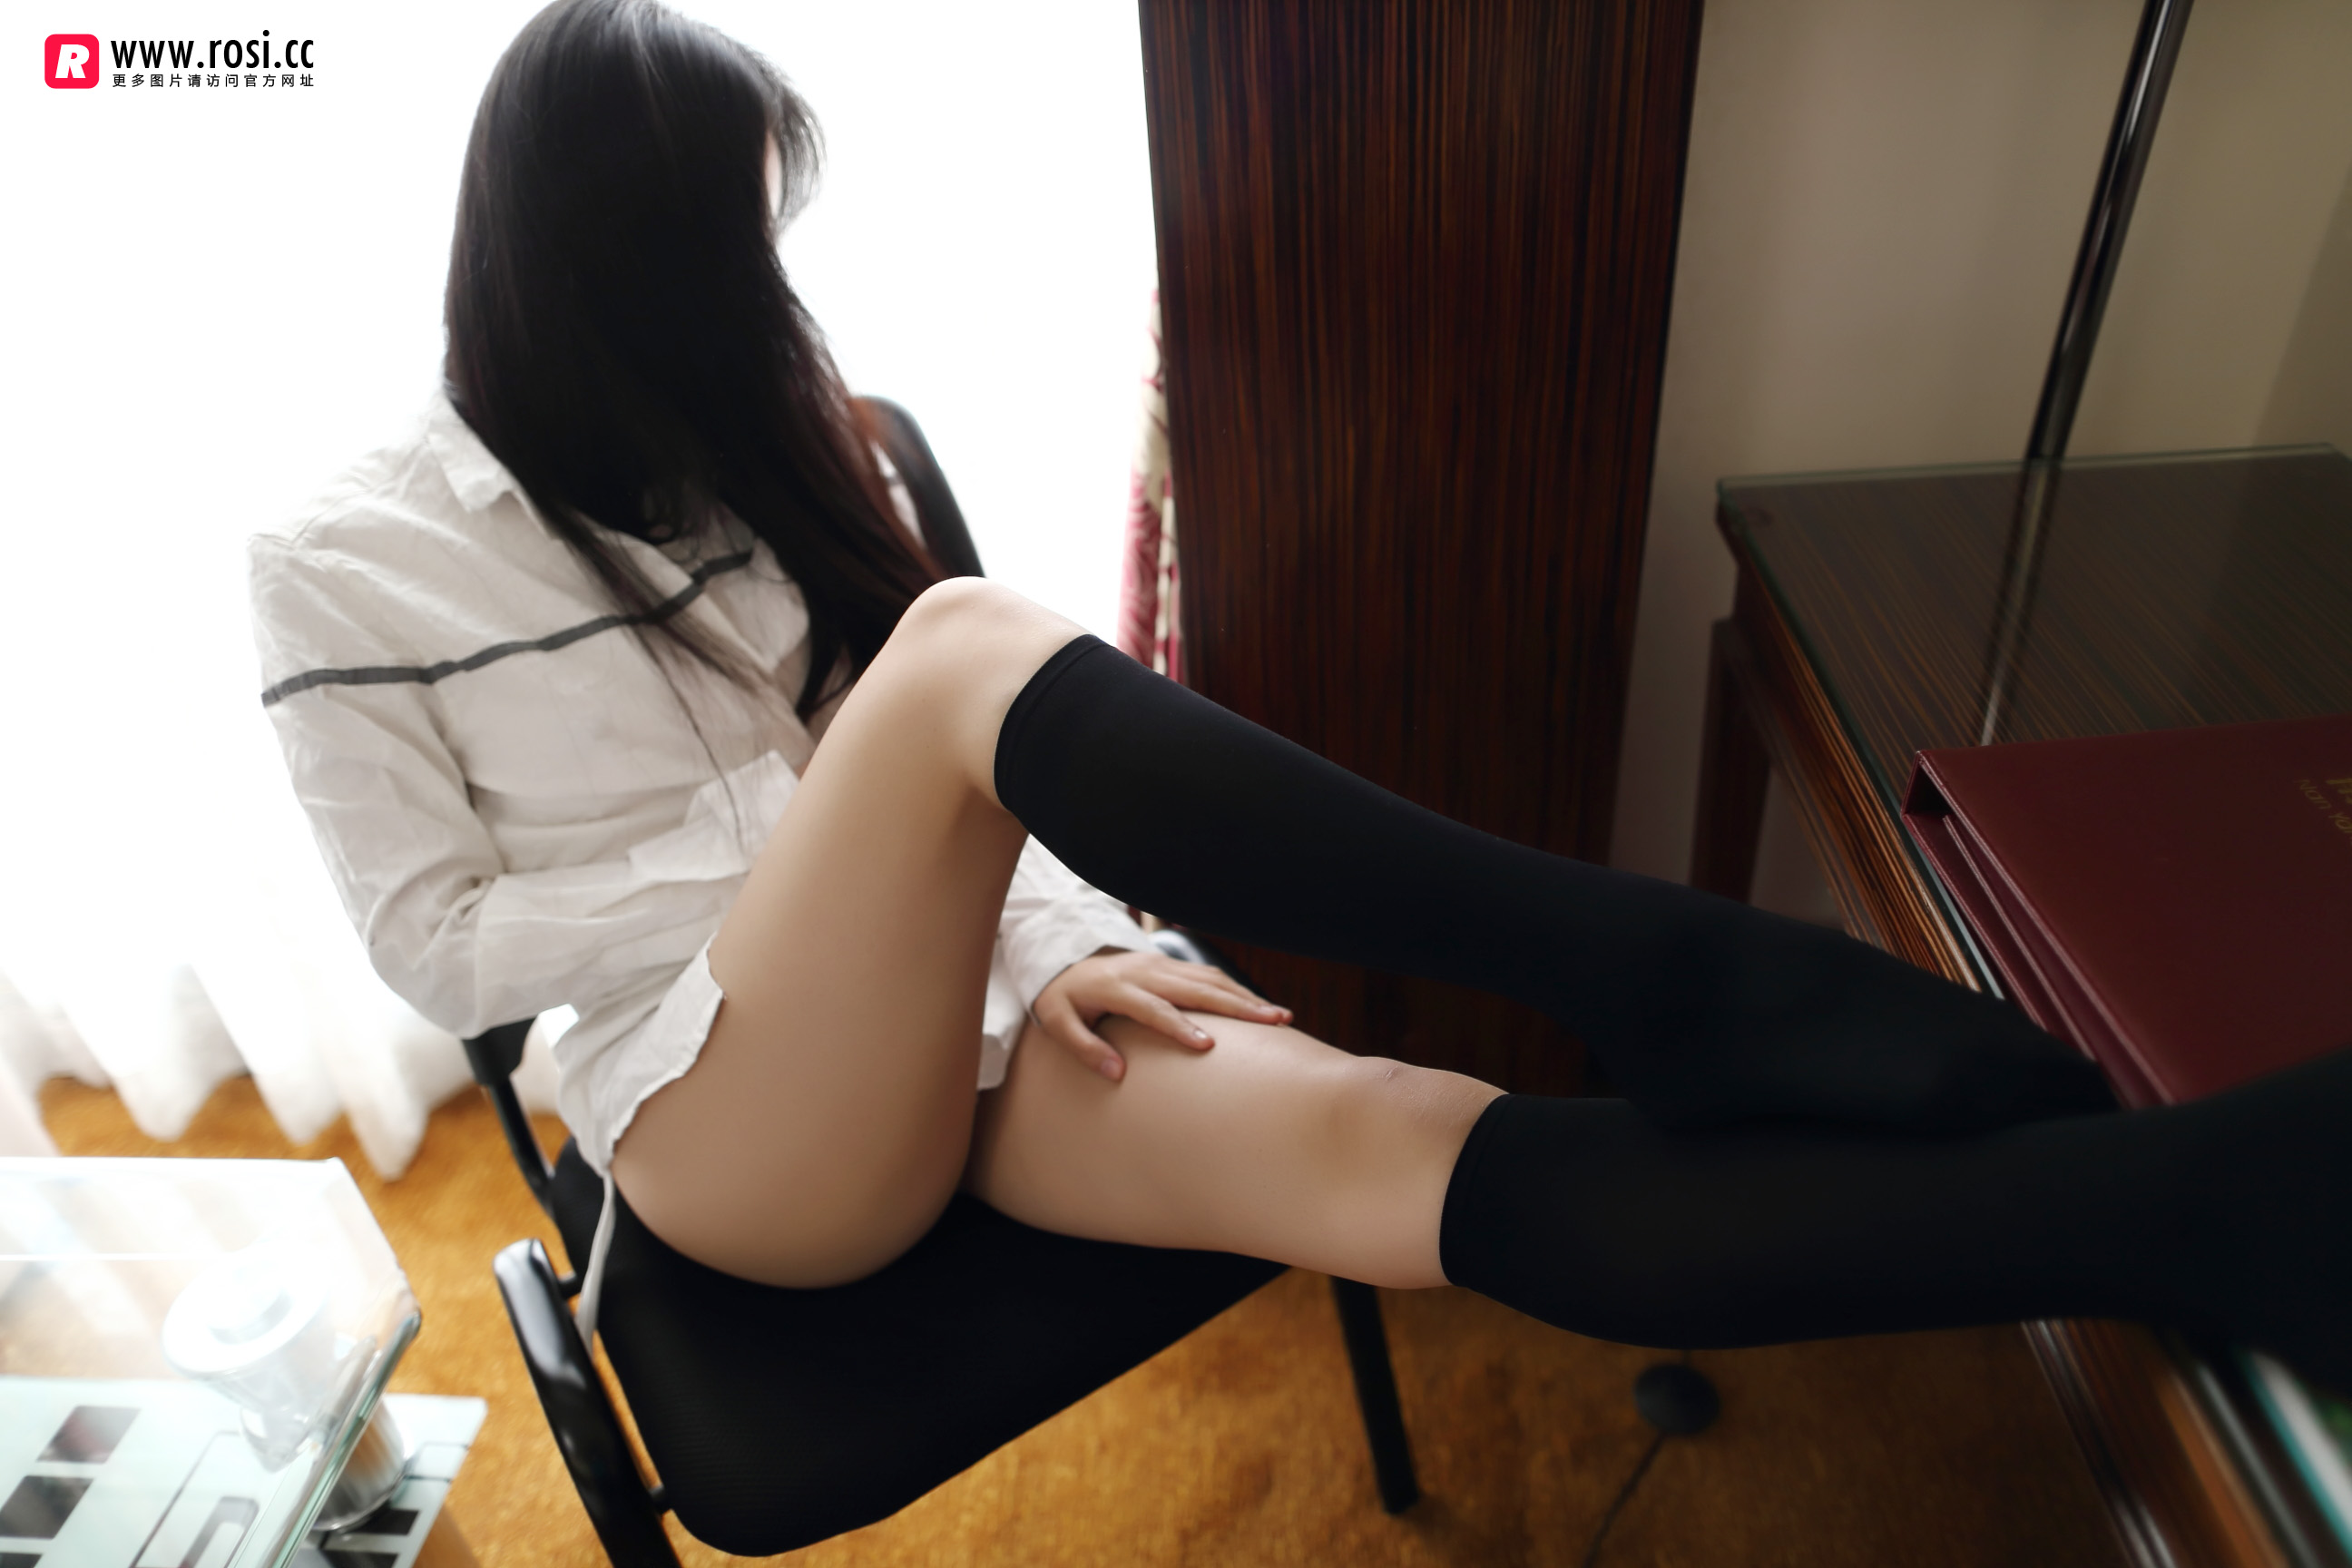 Rosi写真在线看:绅士入内,蓝白胖次伺候(22P)